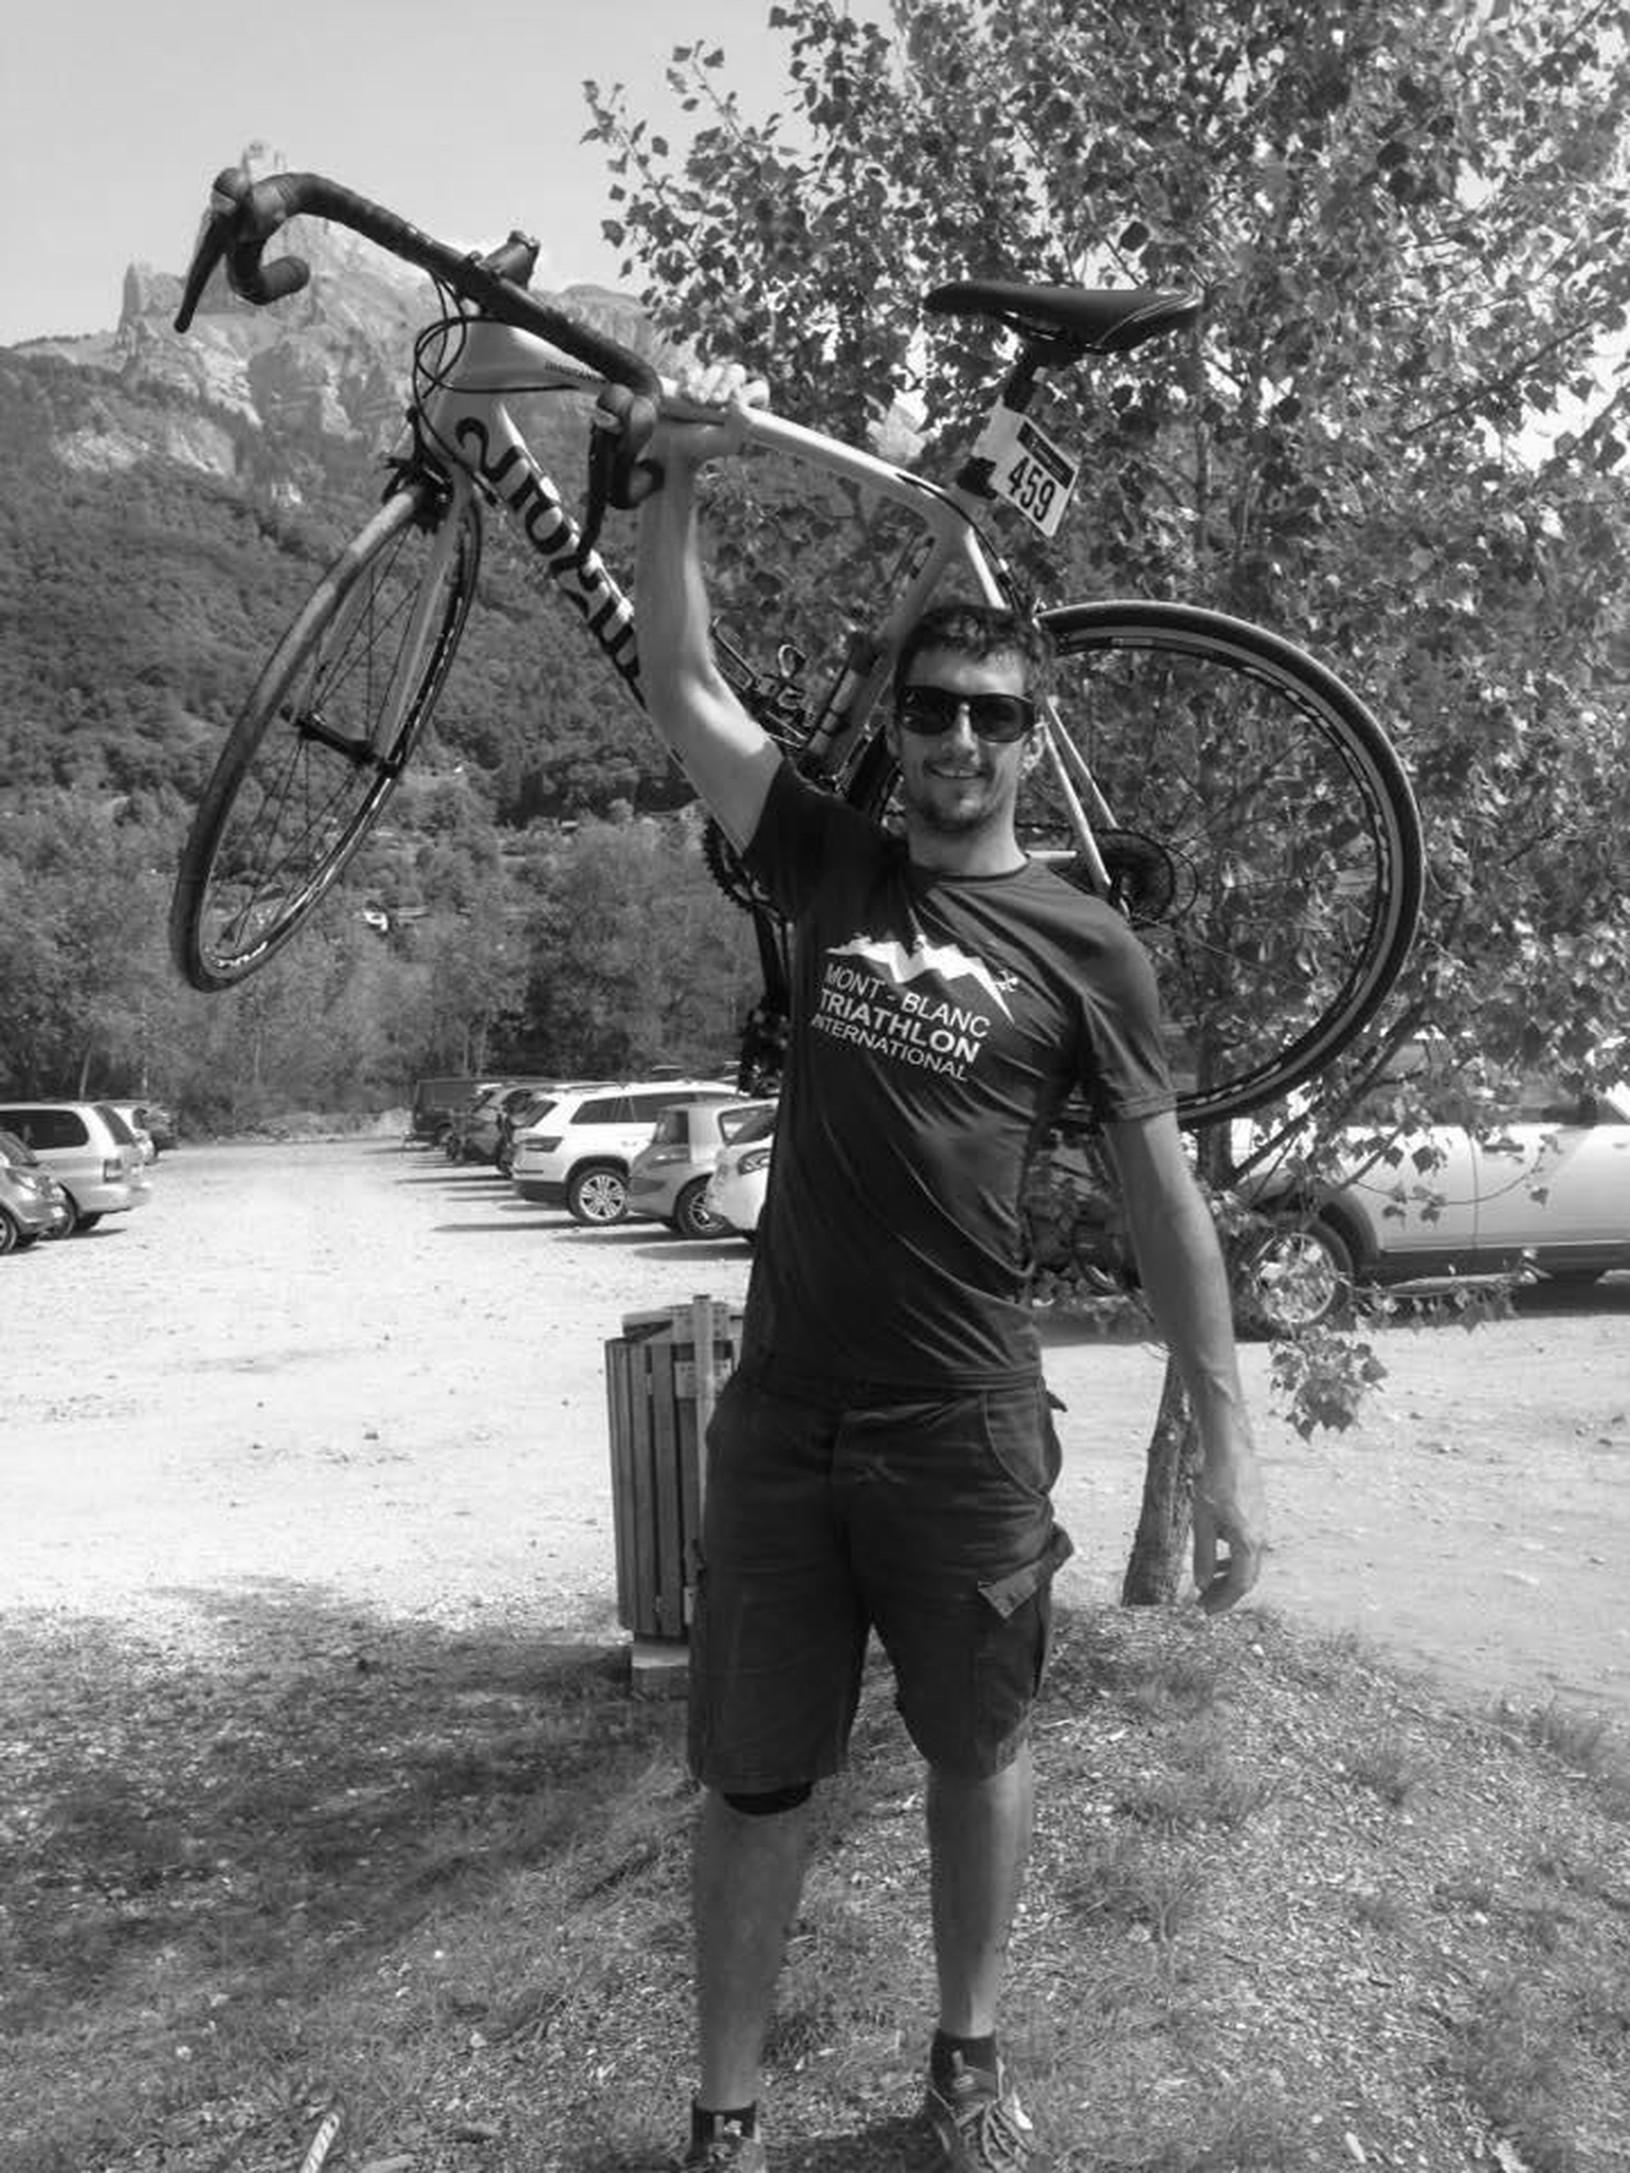 Cyklista Marc Sutton tragicky